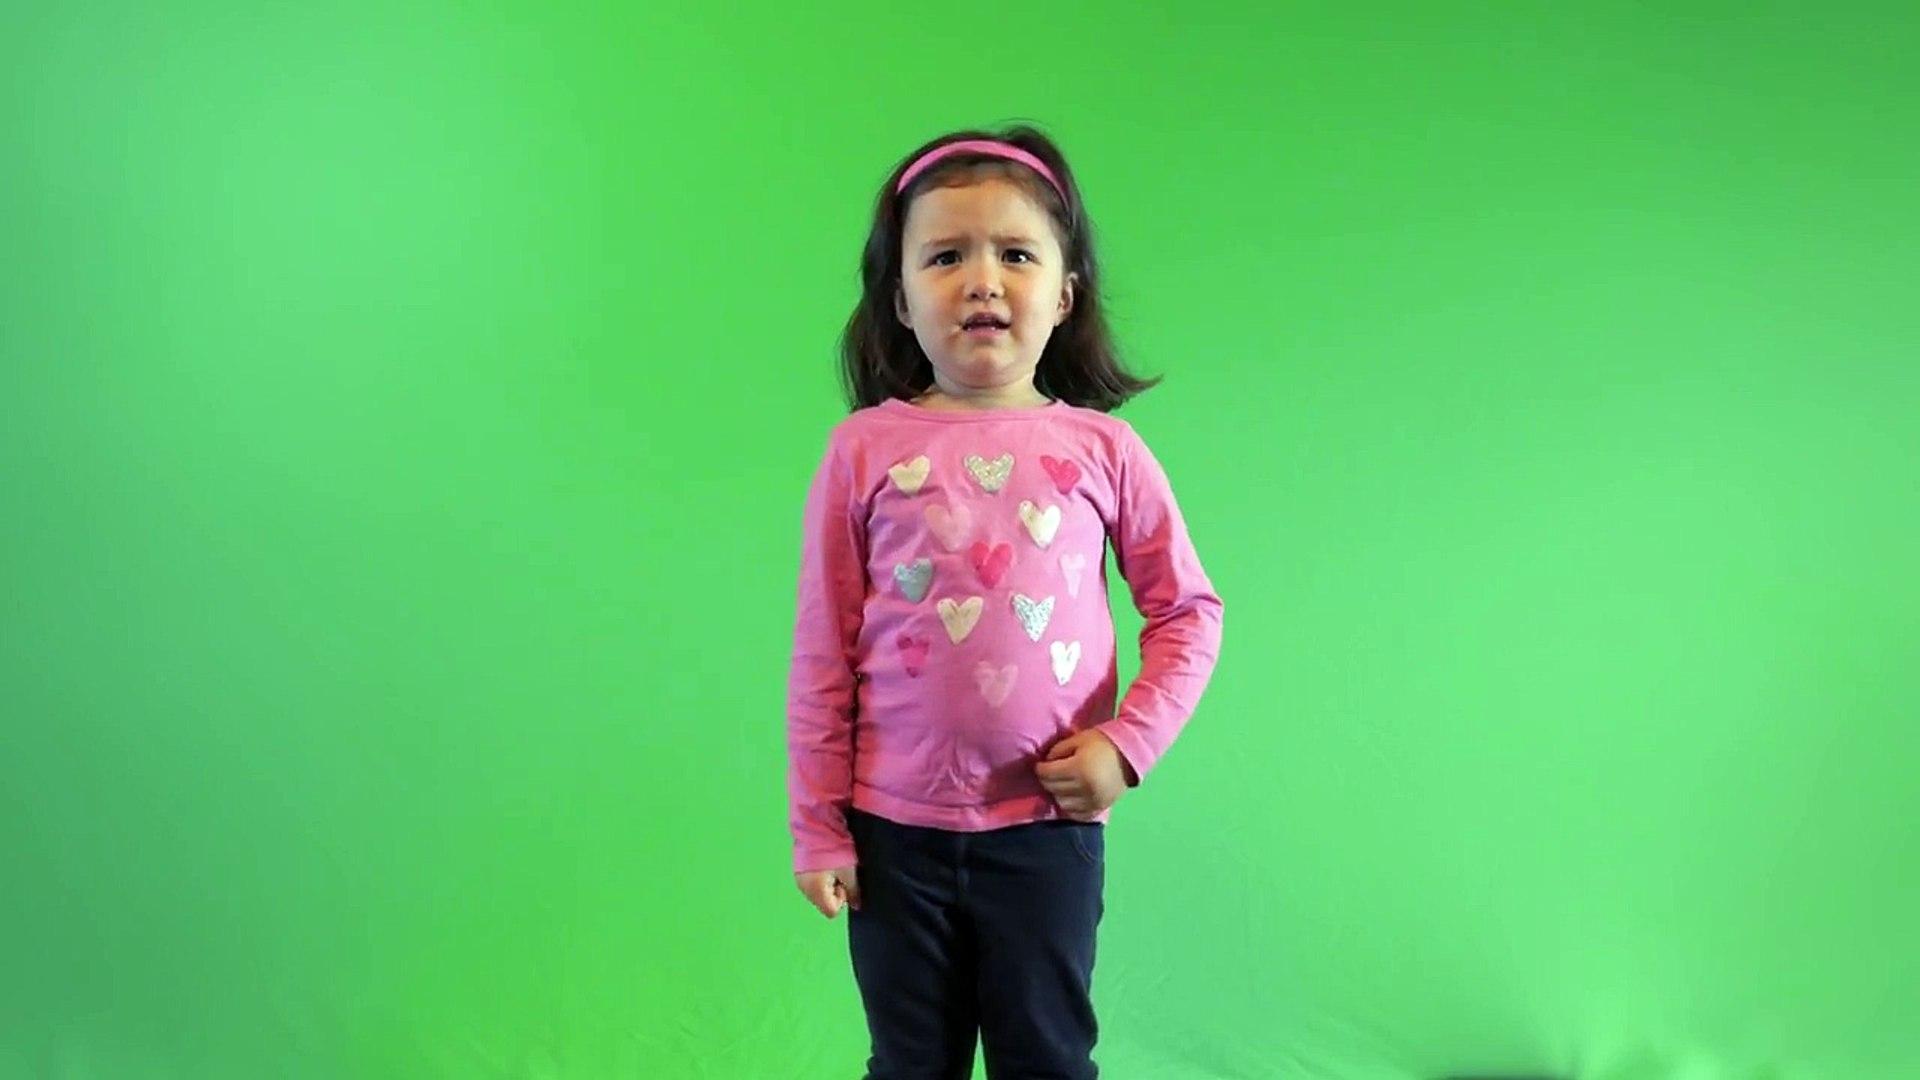 Three-Year-Old Hilariously Parodies Shia LaBeouf's Motivation Speech